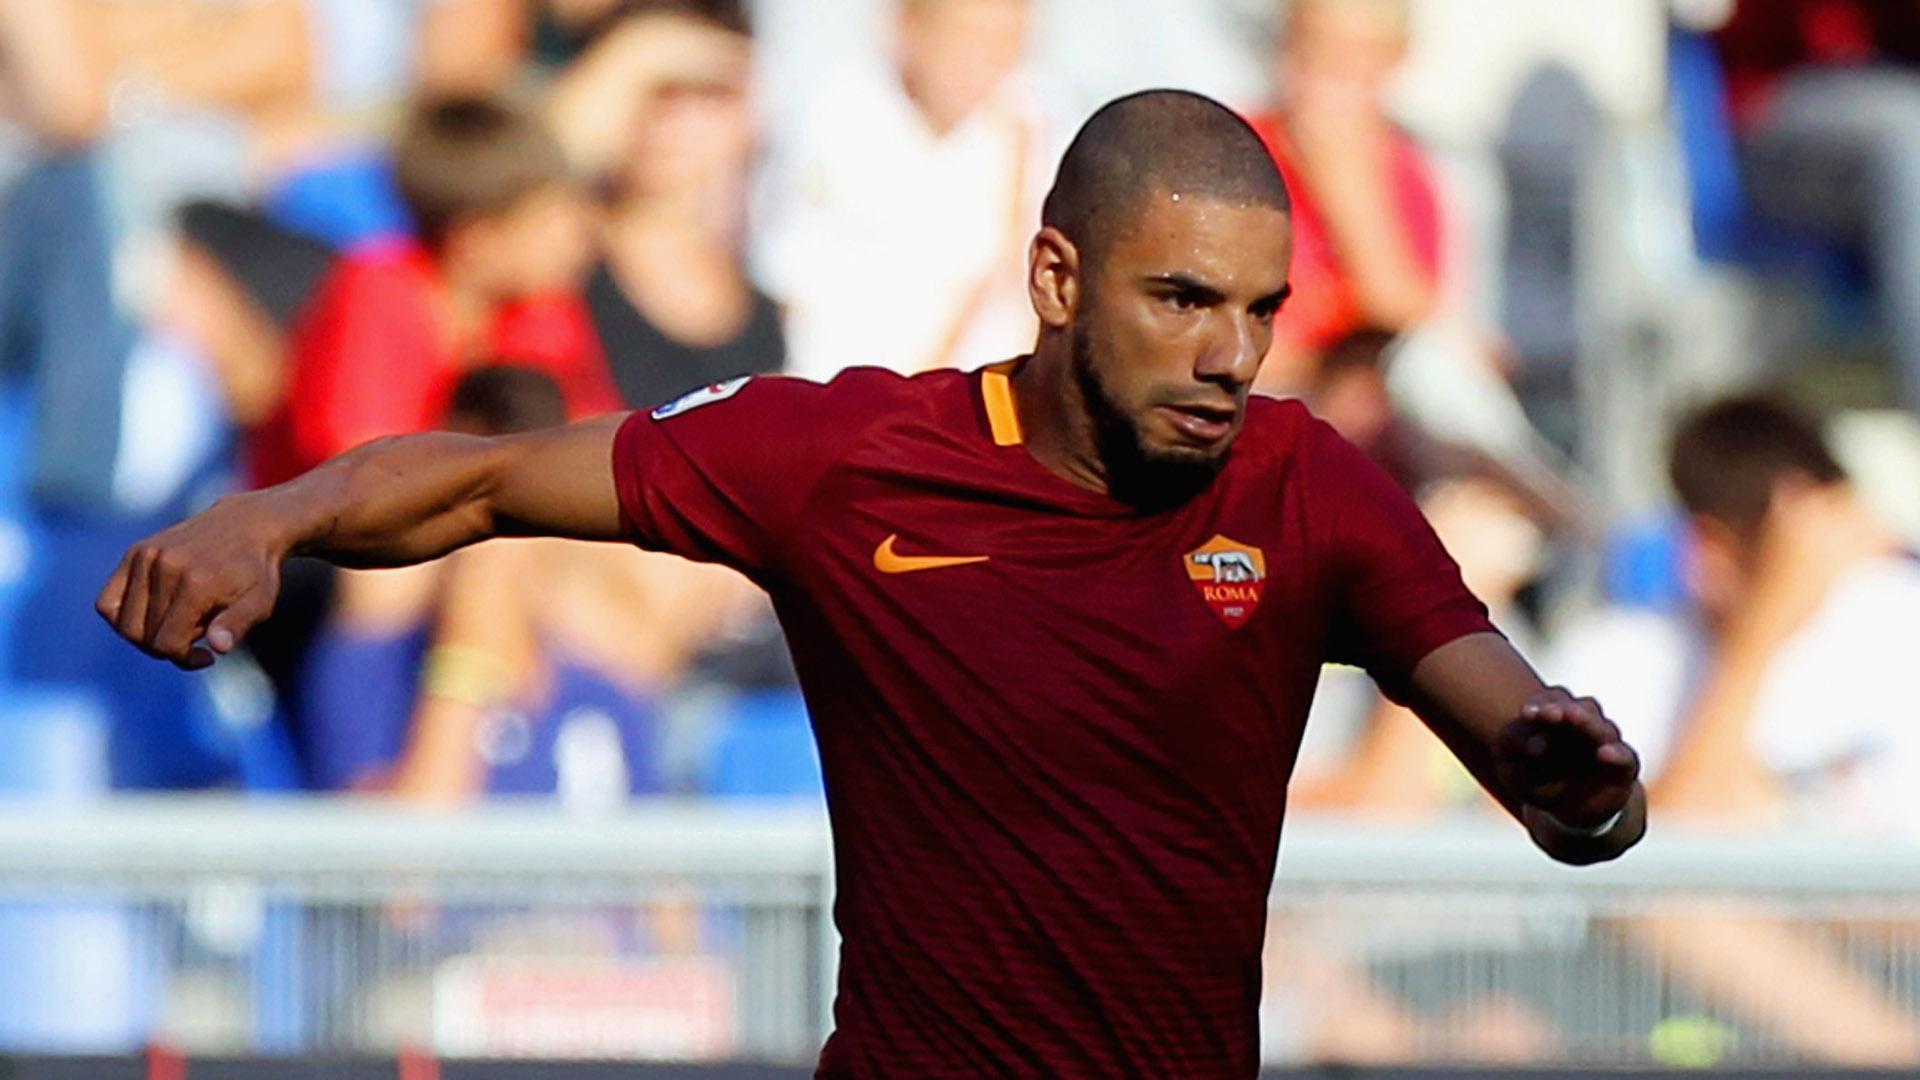 Arriva la Sampdoria, Bruno Peres avverte la Roma: